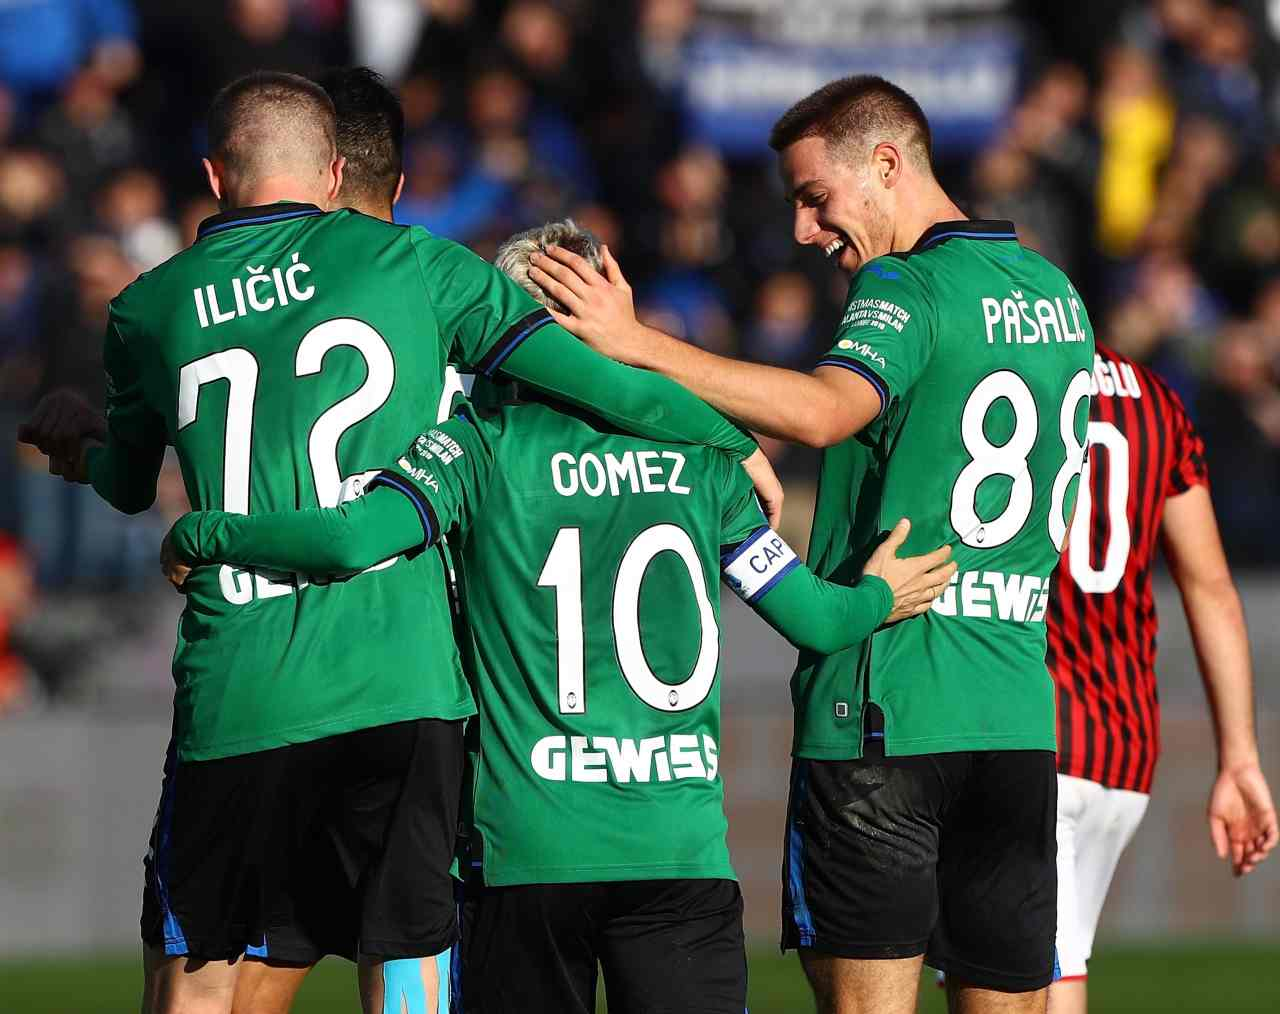 Ilicic Gomez Pasalic Atalanta-Milan